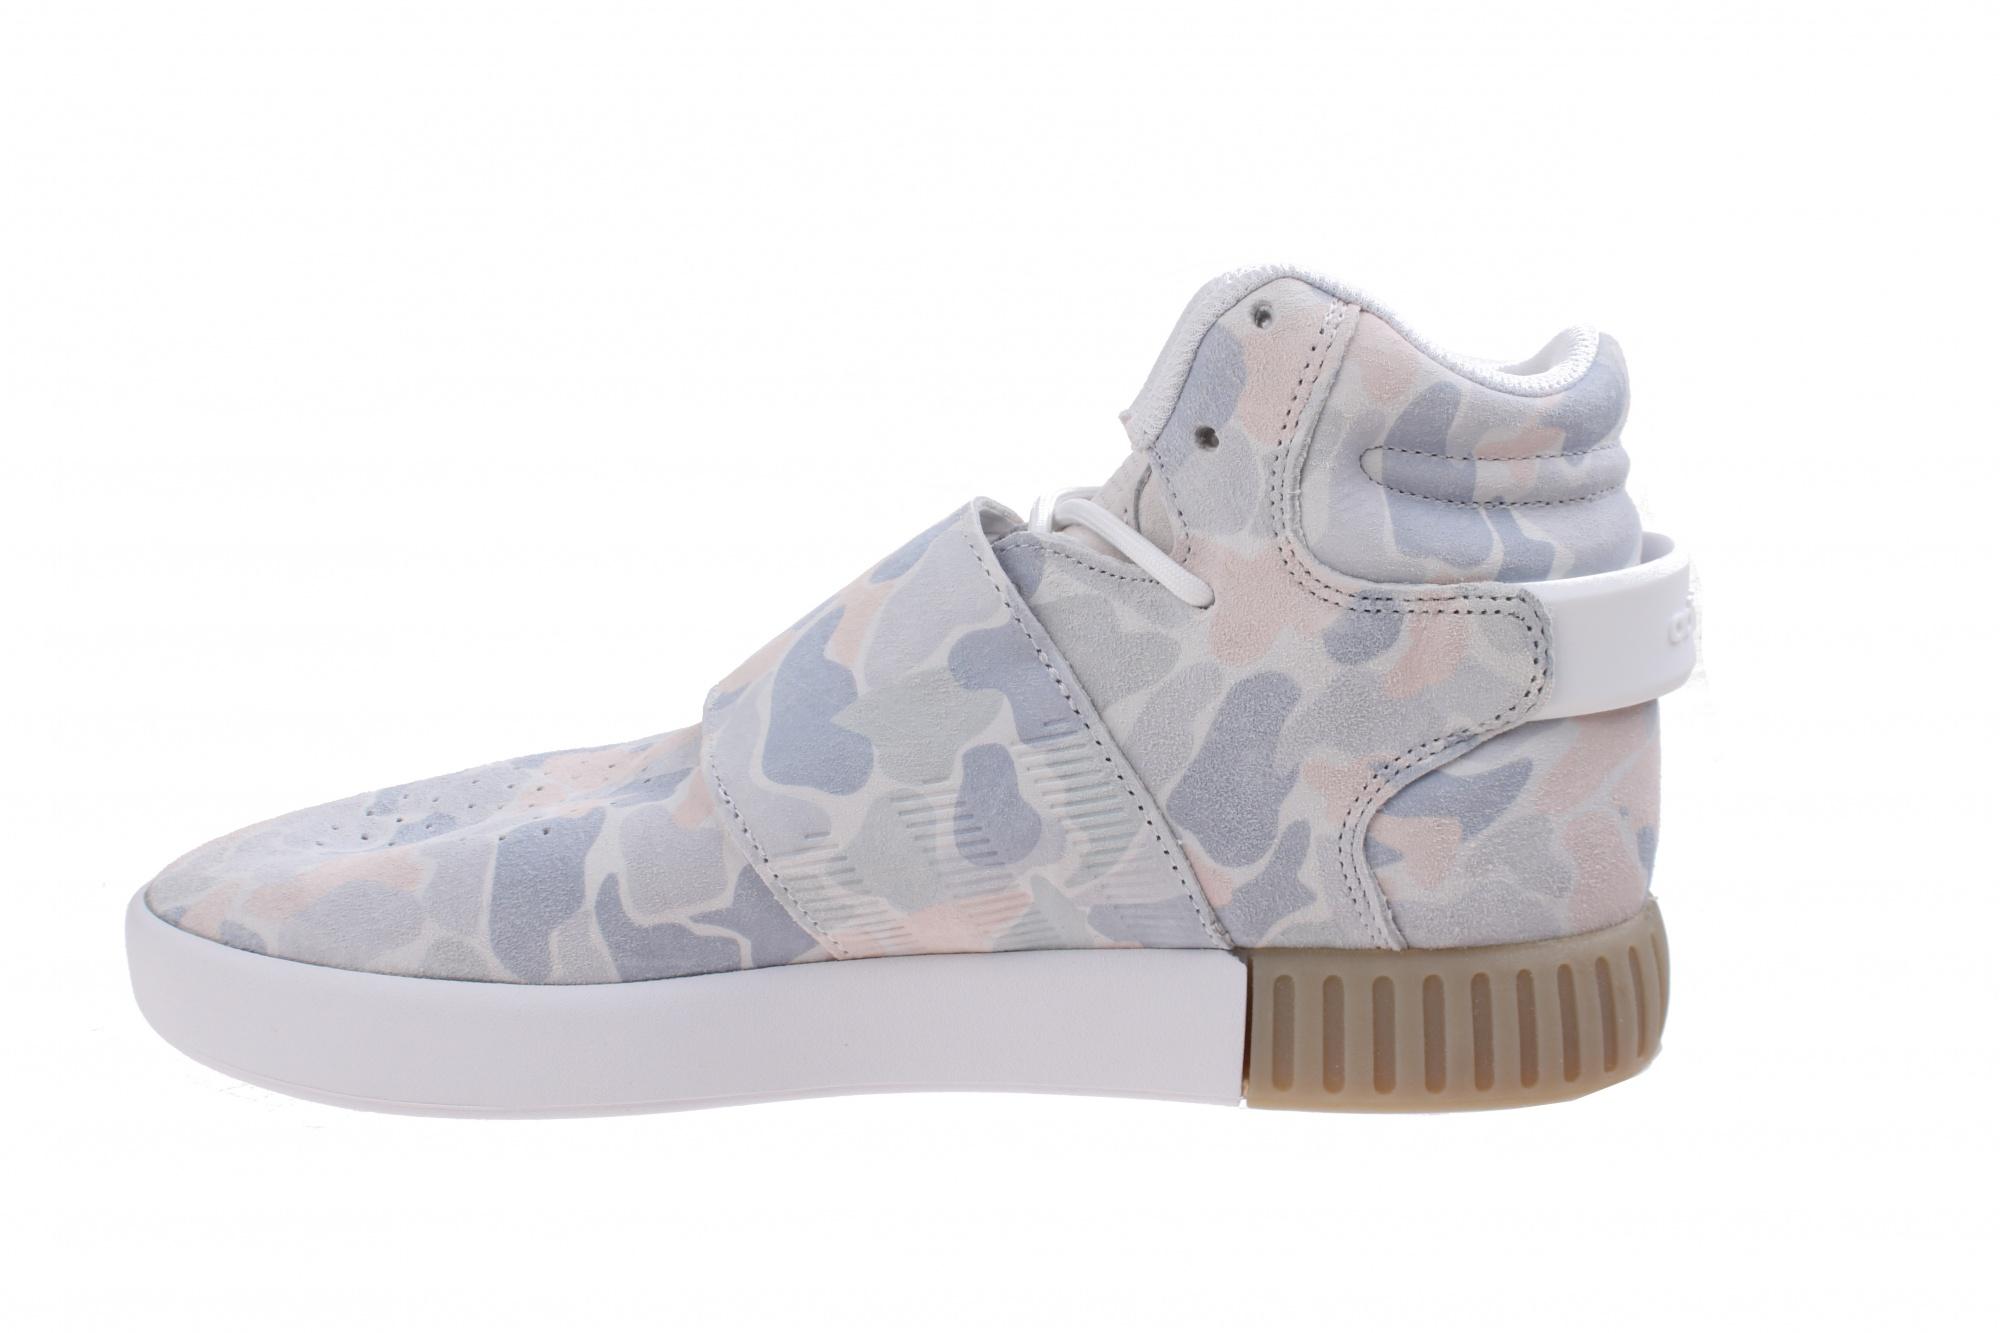 Adidas sneakers Tubular Invader Strap heren maat 46